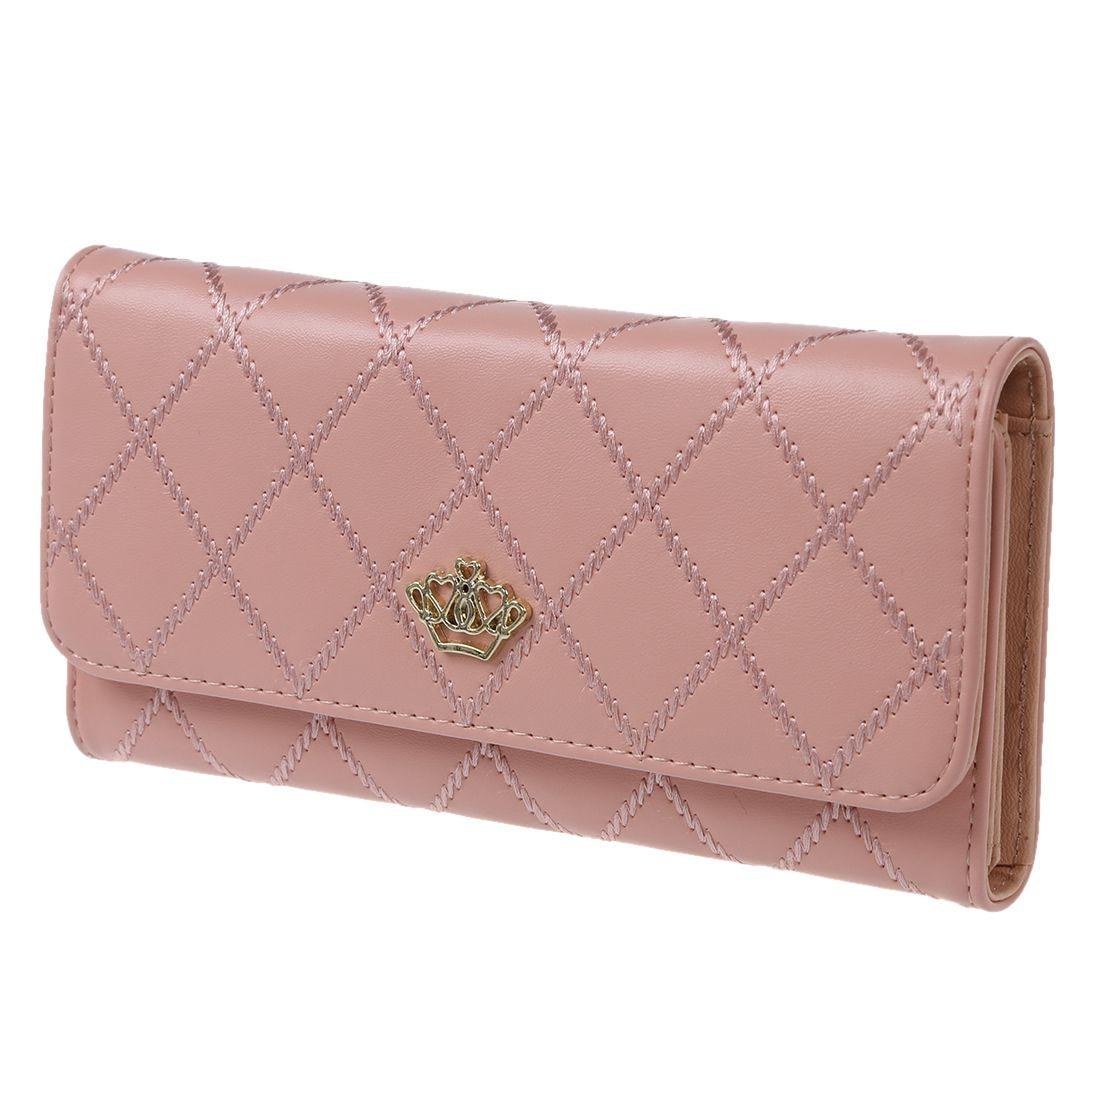 Fashion Sweet Elegant Women Lady Long Clutch Purse Bags Handbag Leather Card Holder Wallet Pink/Rose Red/Black/Blue/Purple Light рюкзак hama sweet owl pink blue